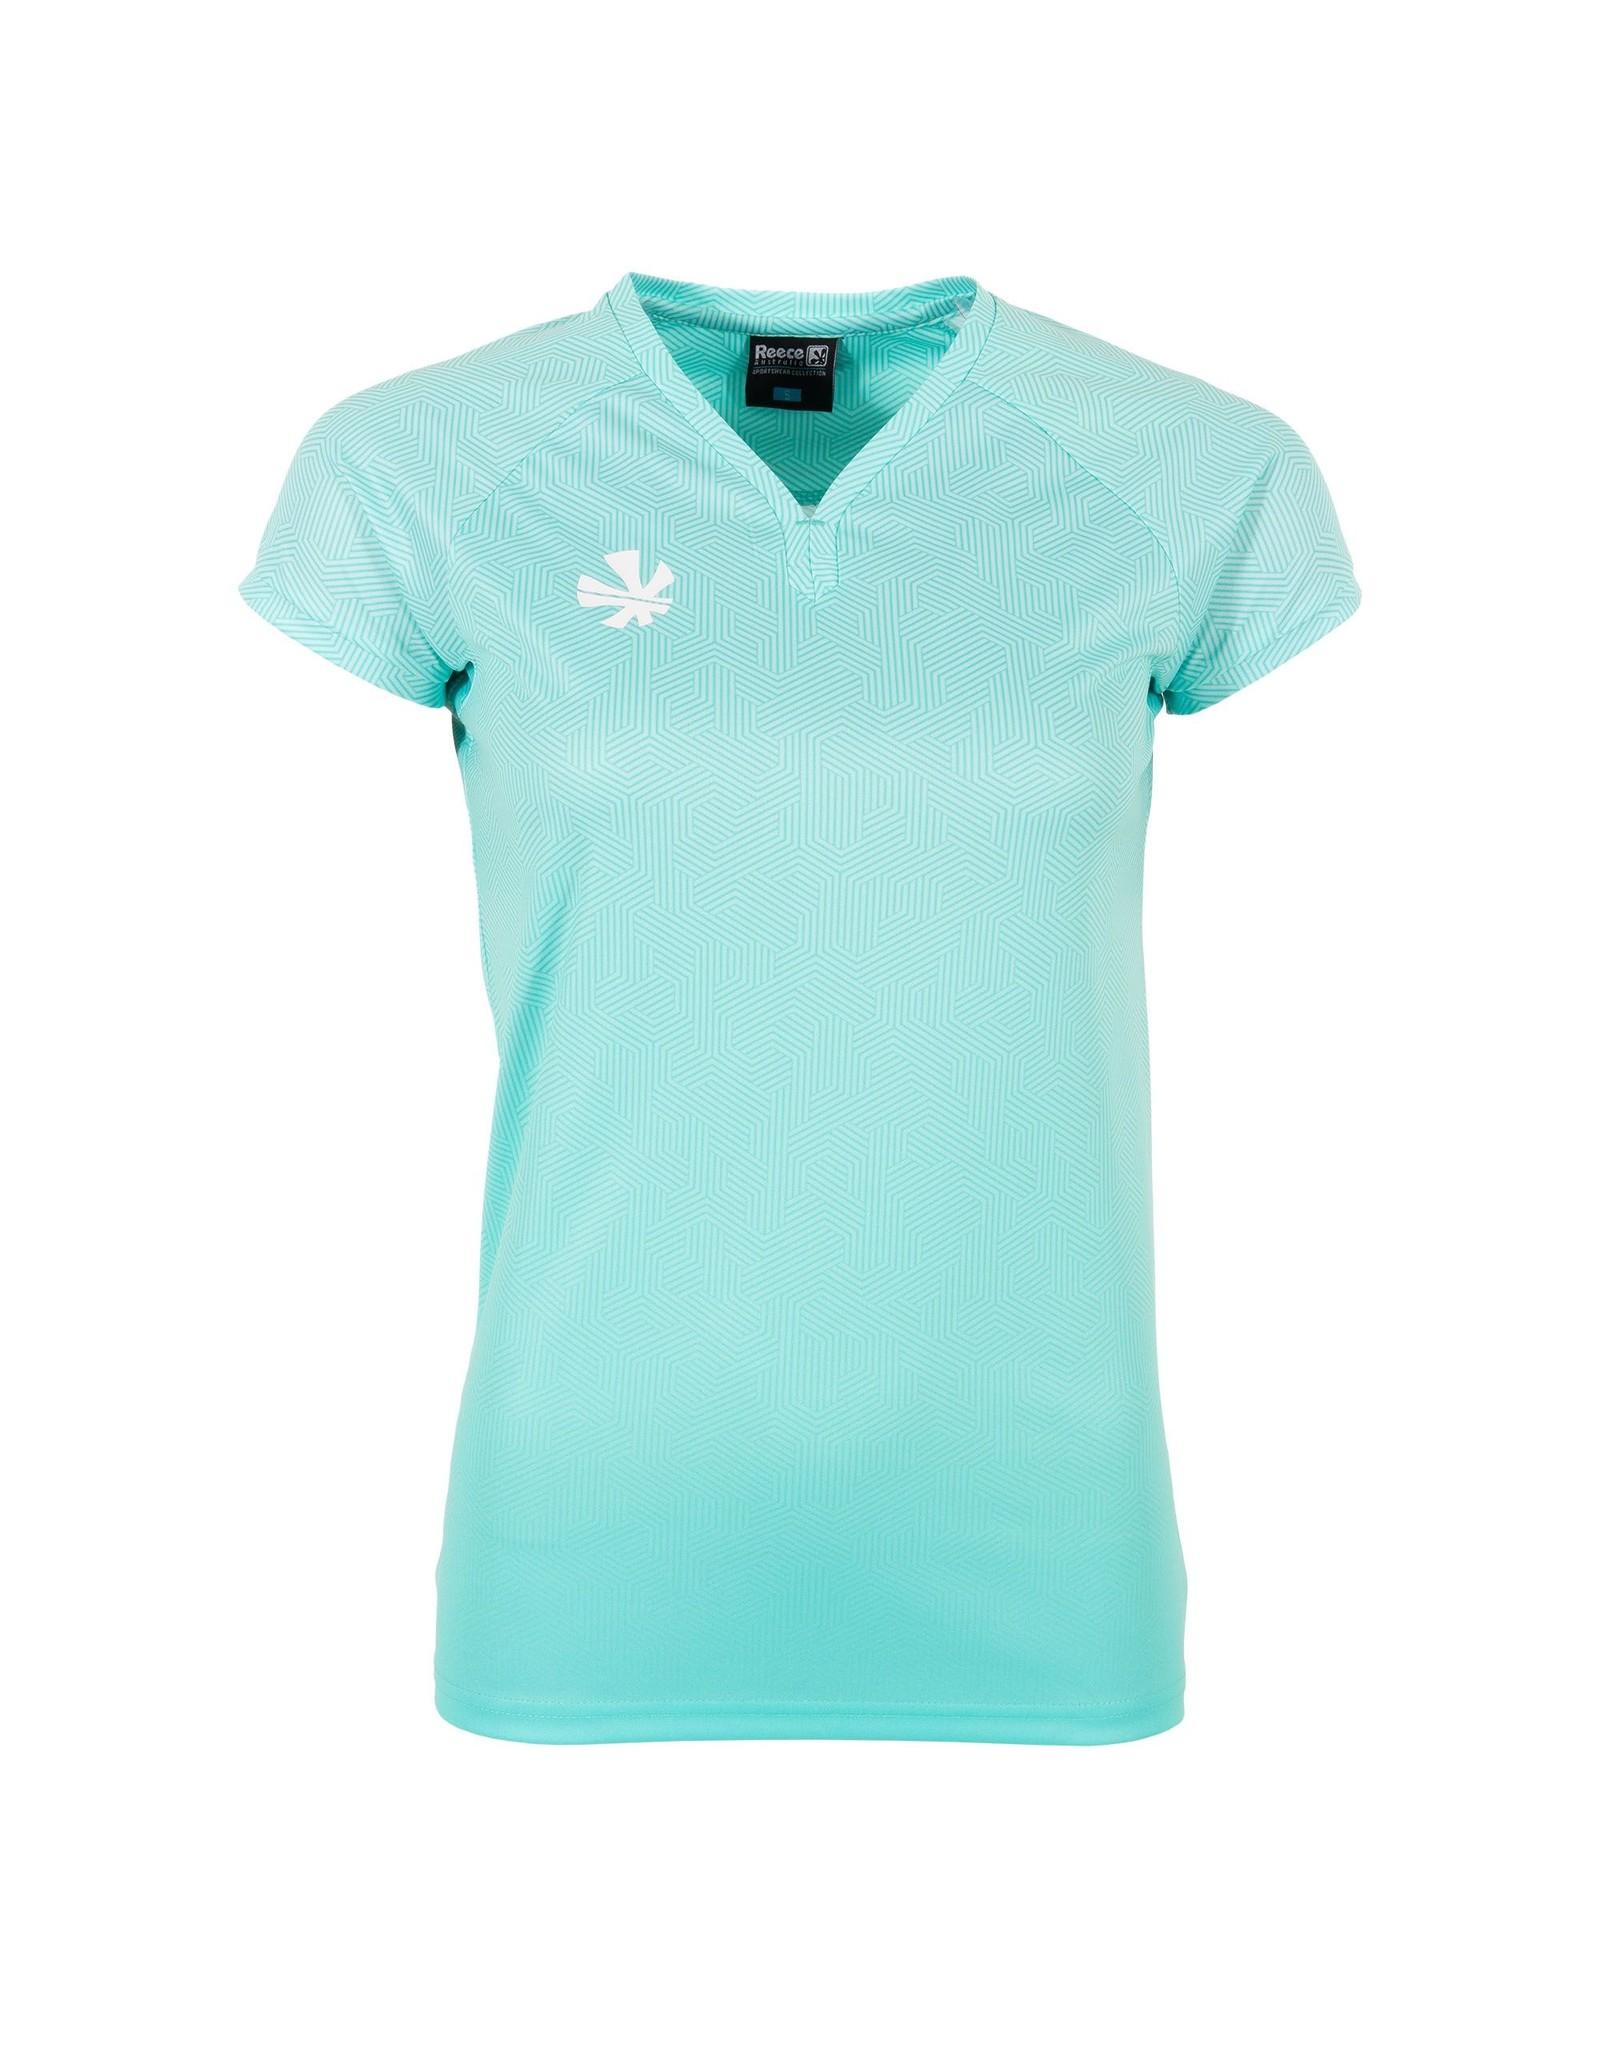 Reece Australia Ellis Shirt Limited Ladies-Groen